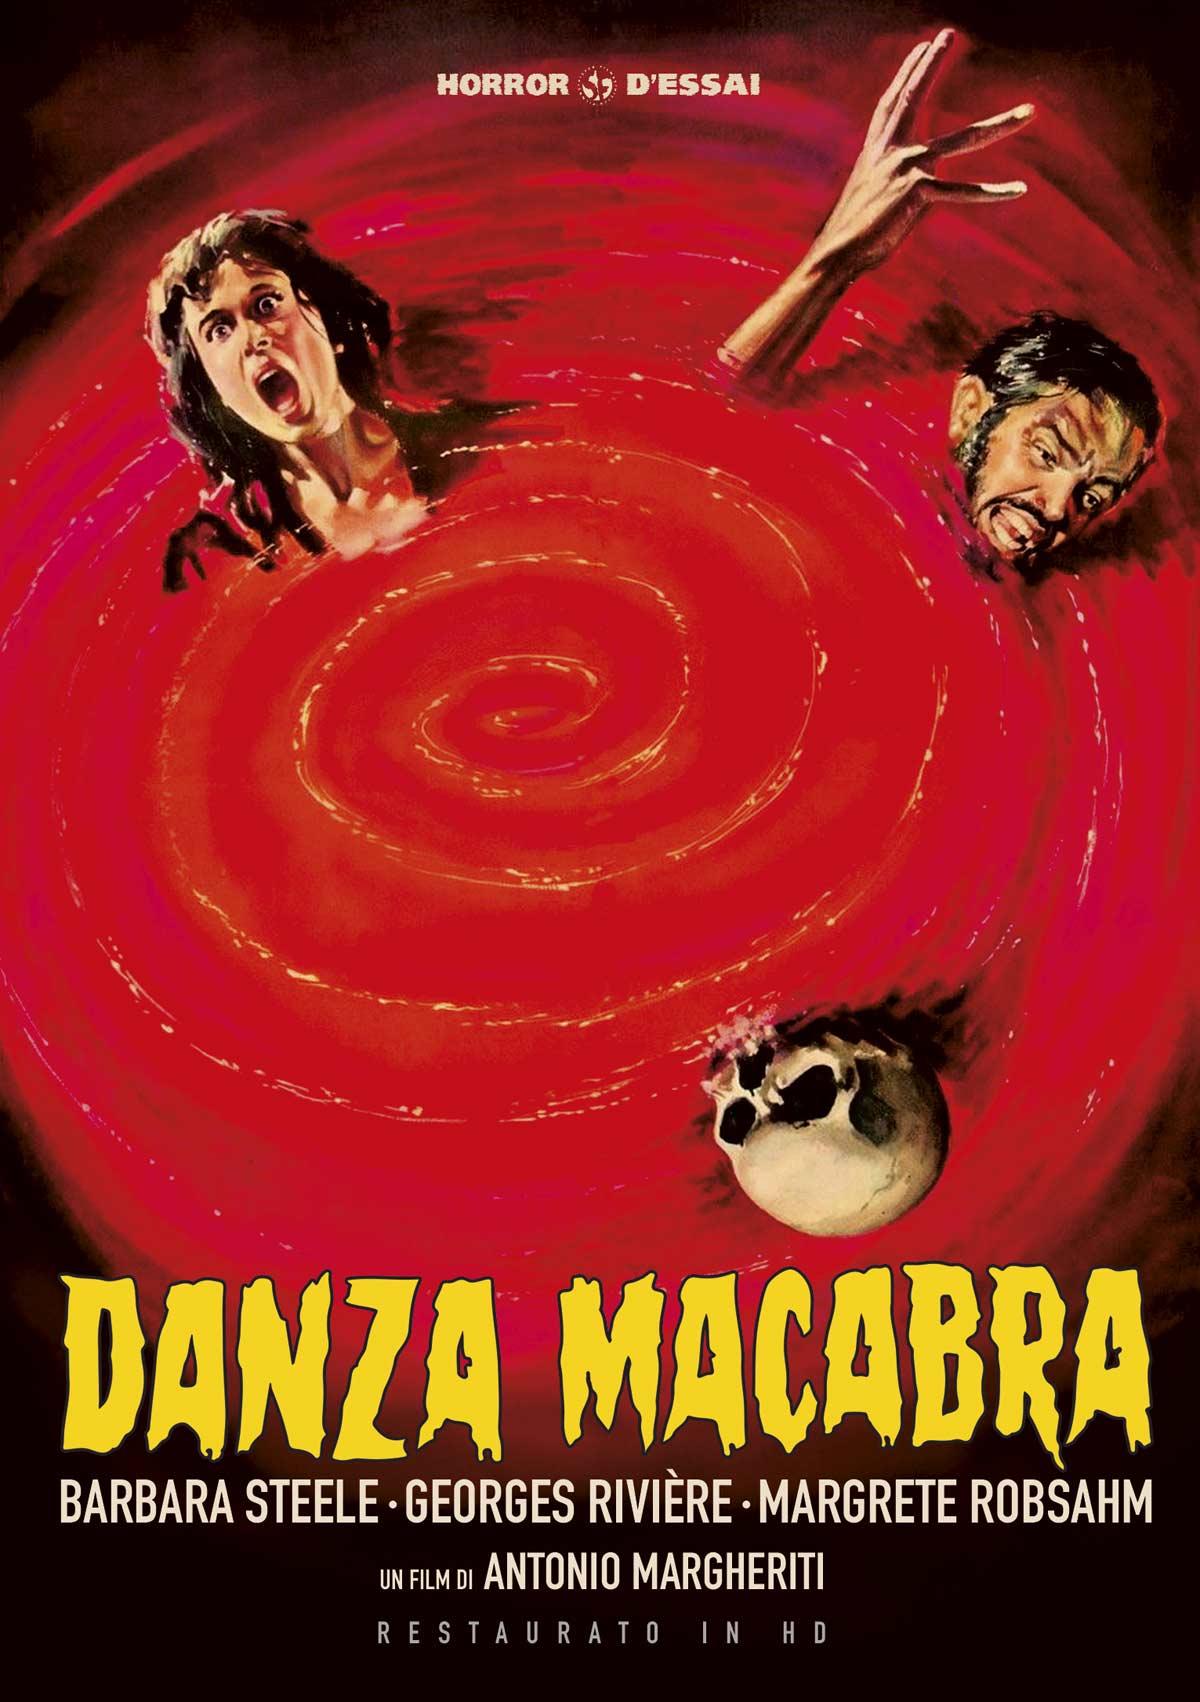 DANZA MACABRA (RESTAURATO IN HD) (DVD)